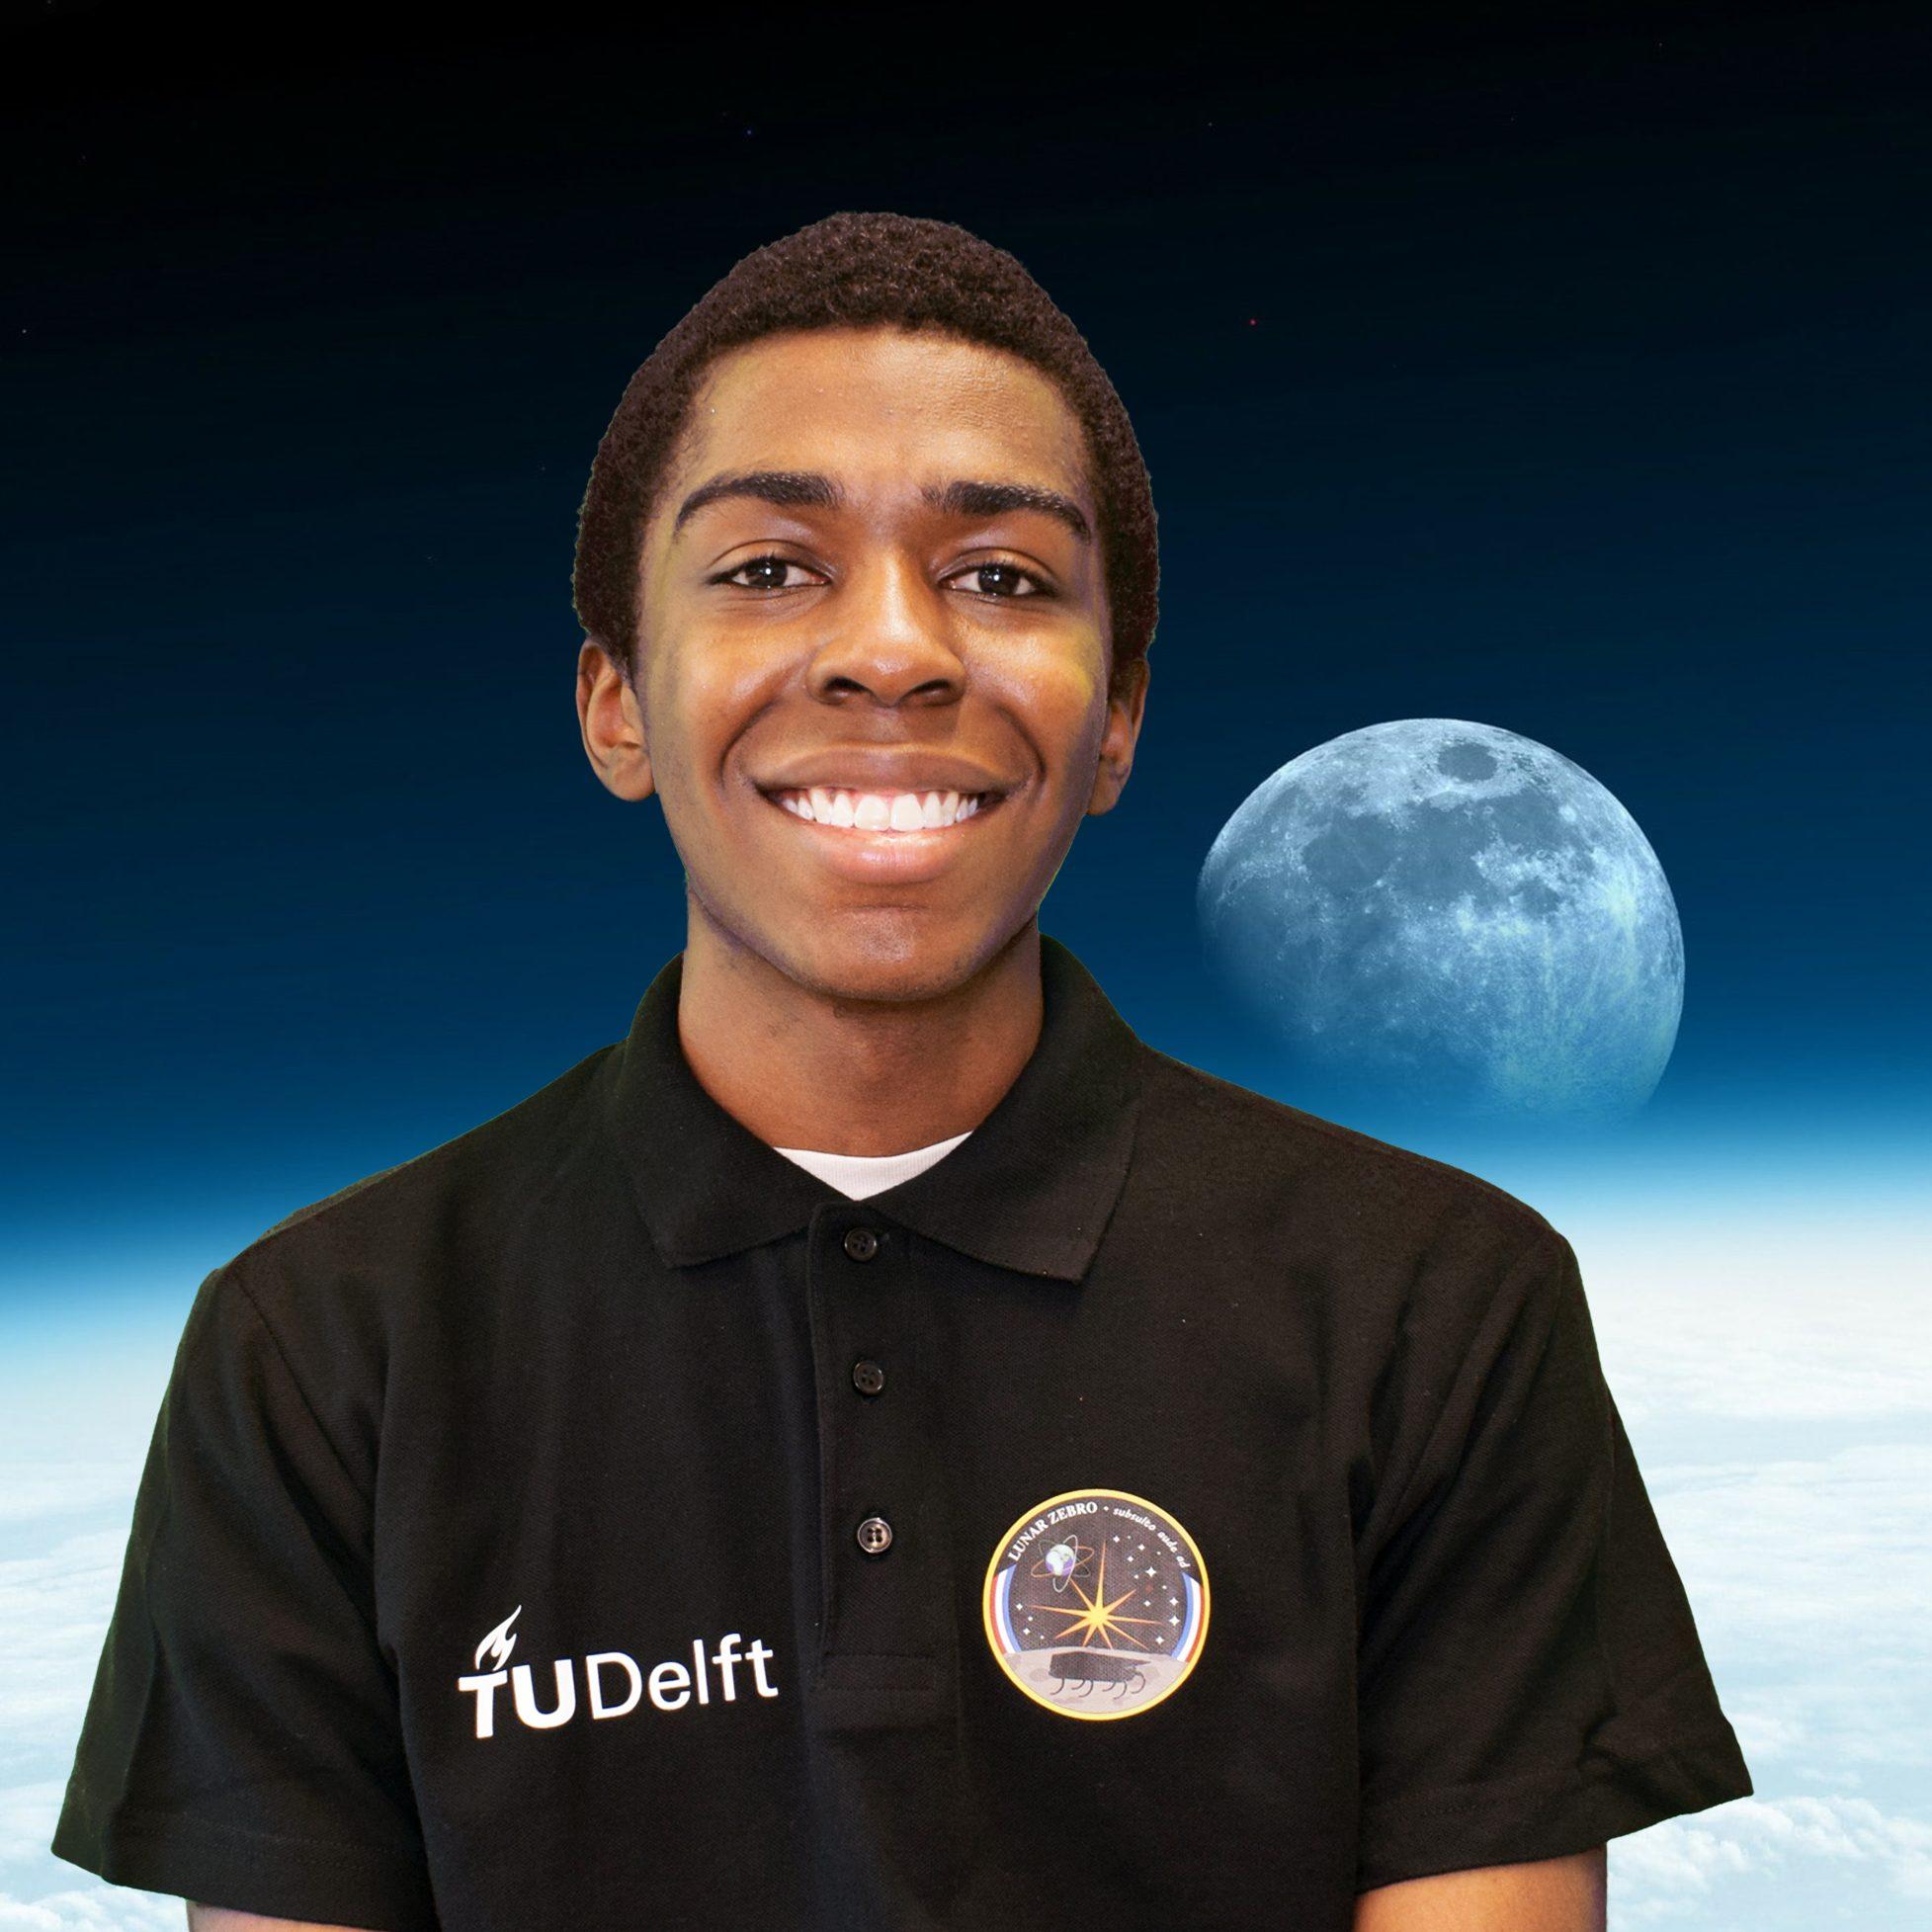 Olasoji Makinwa Lunar Zebro IGLUNA member